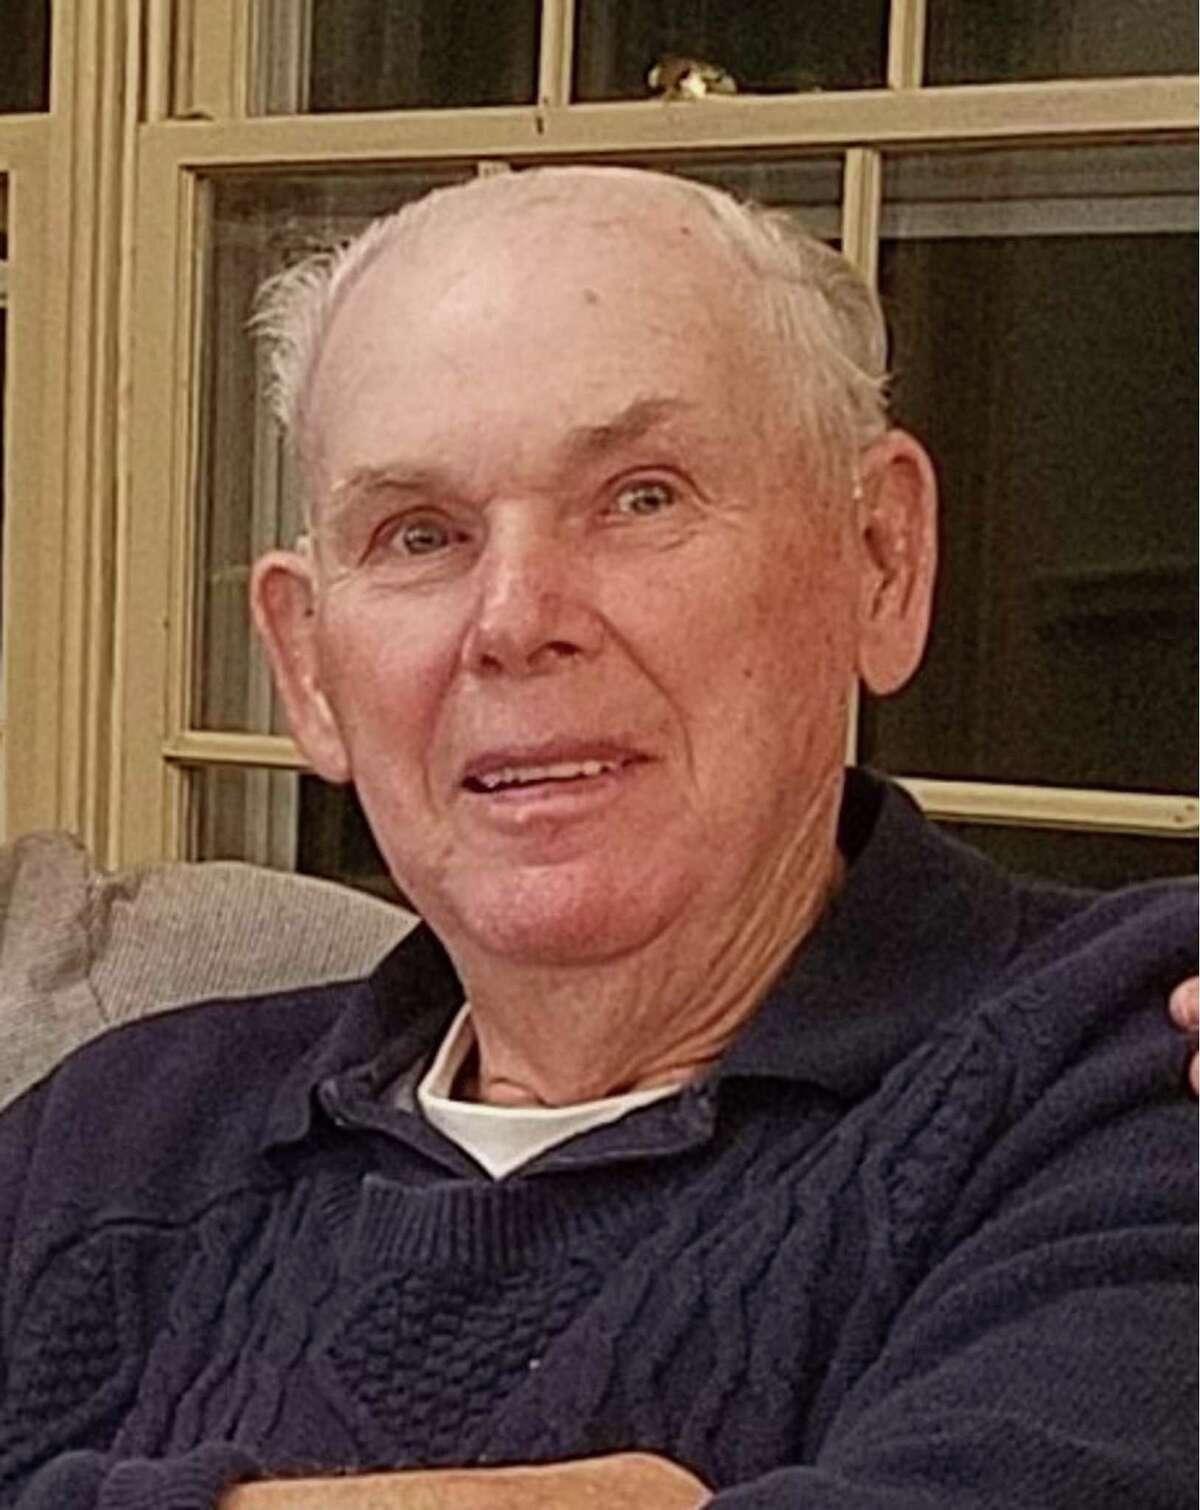 Longtime Bridgewater resident Don Shail, a member of the Bridgewater Volunteer Fire Department, died April 14.